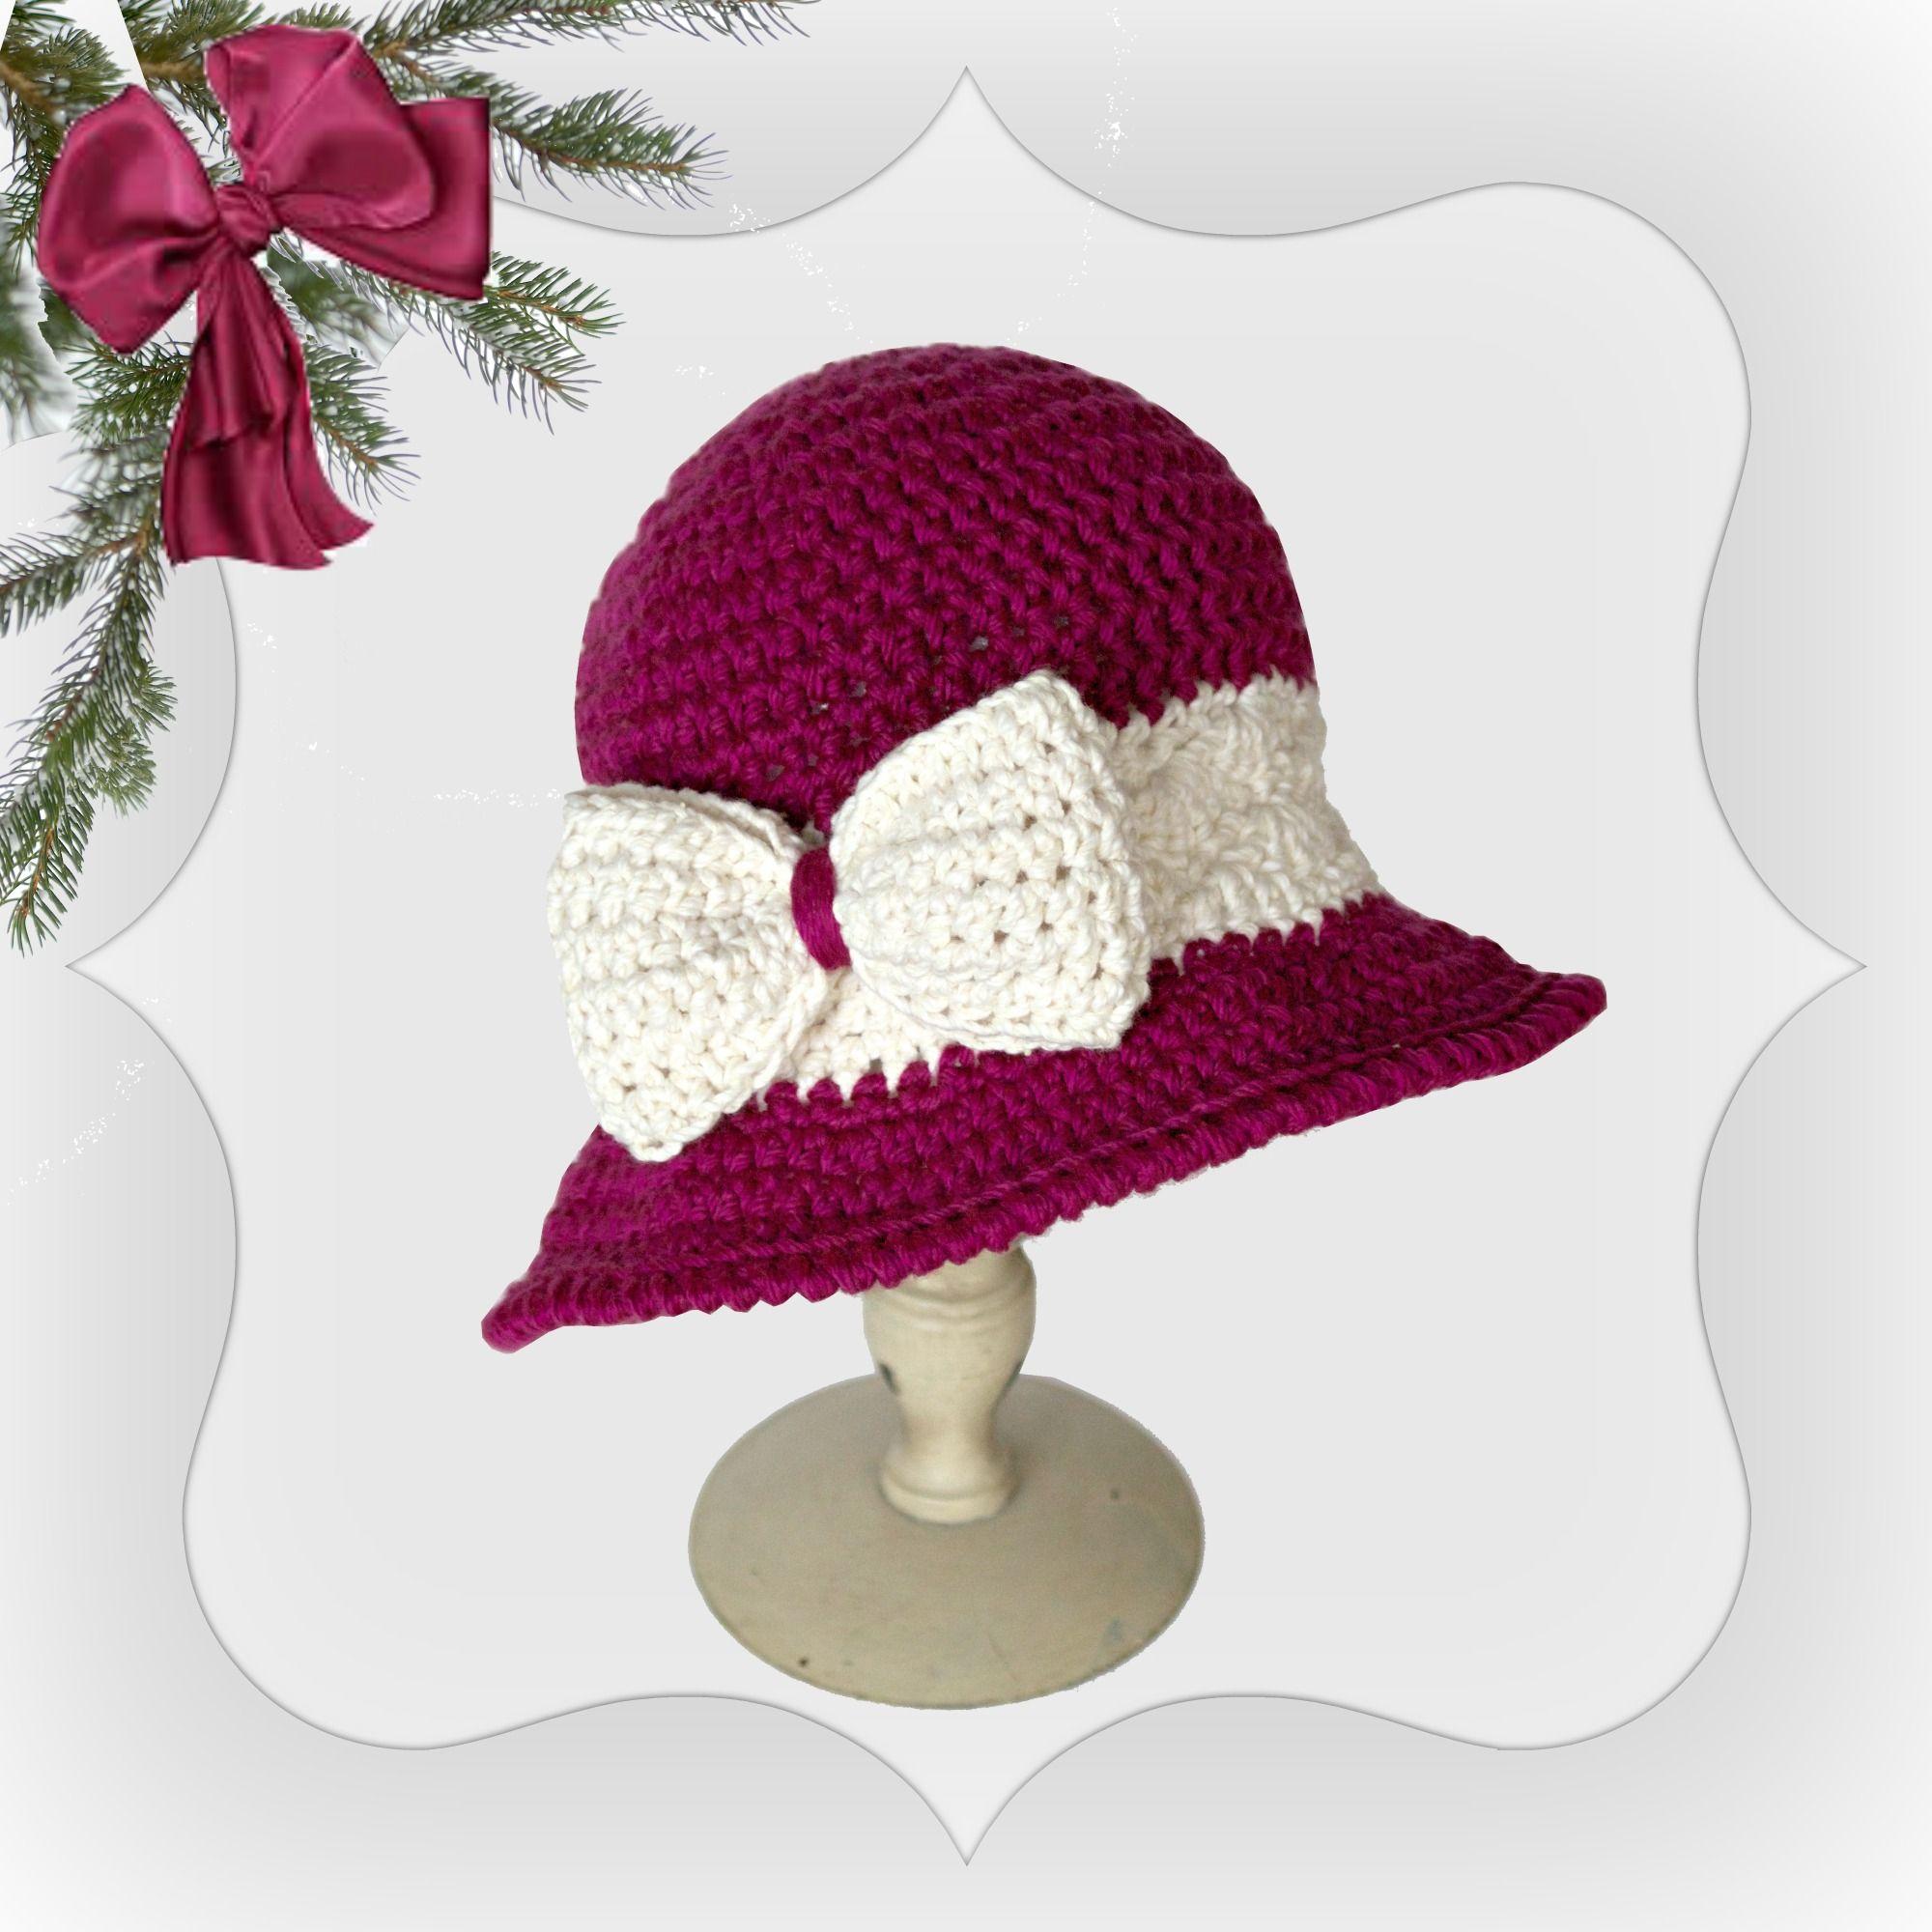 free crochet pattern for hat christmas joy | Crotchet | Pinterest ...